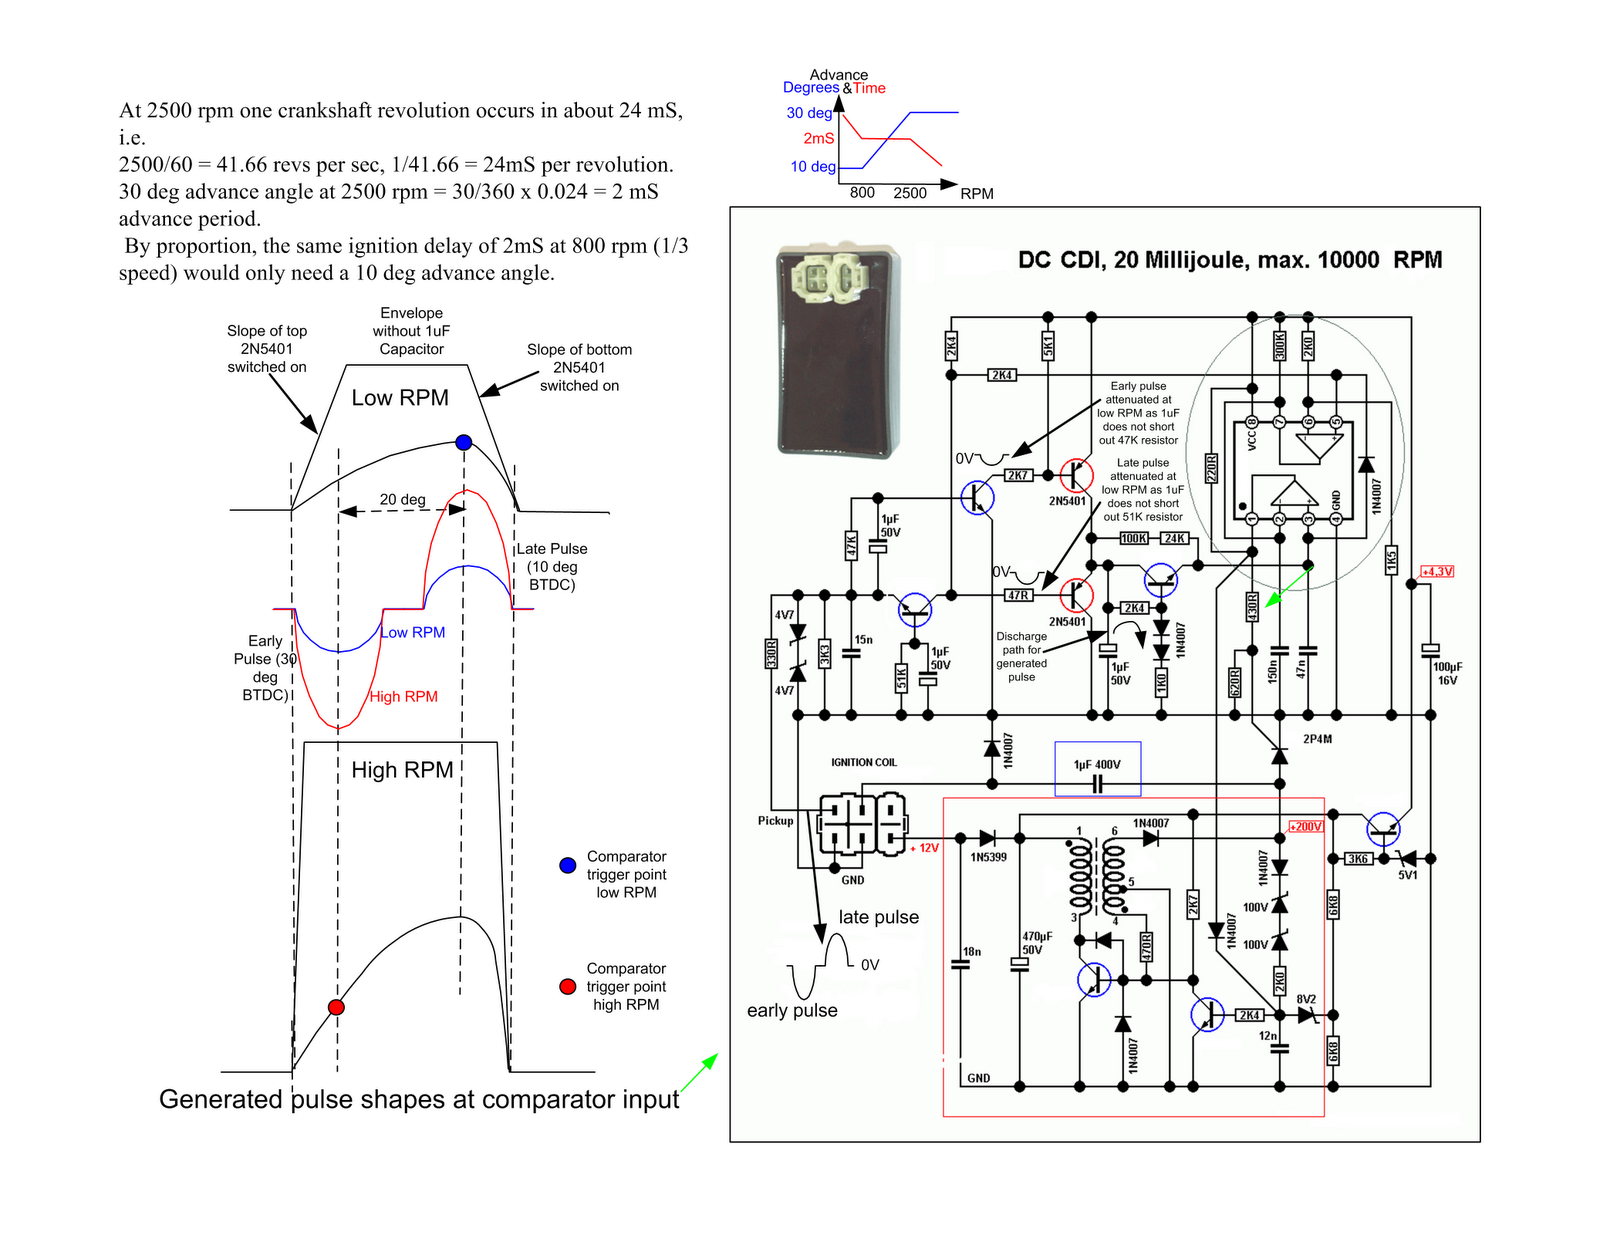 8 wire cdi box diagram wiring diagram blog8 wire cdi box diagram wiring library a honda [ 1600 x 1242 Pixel ]